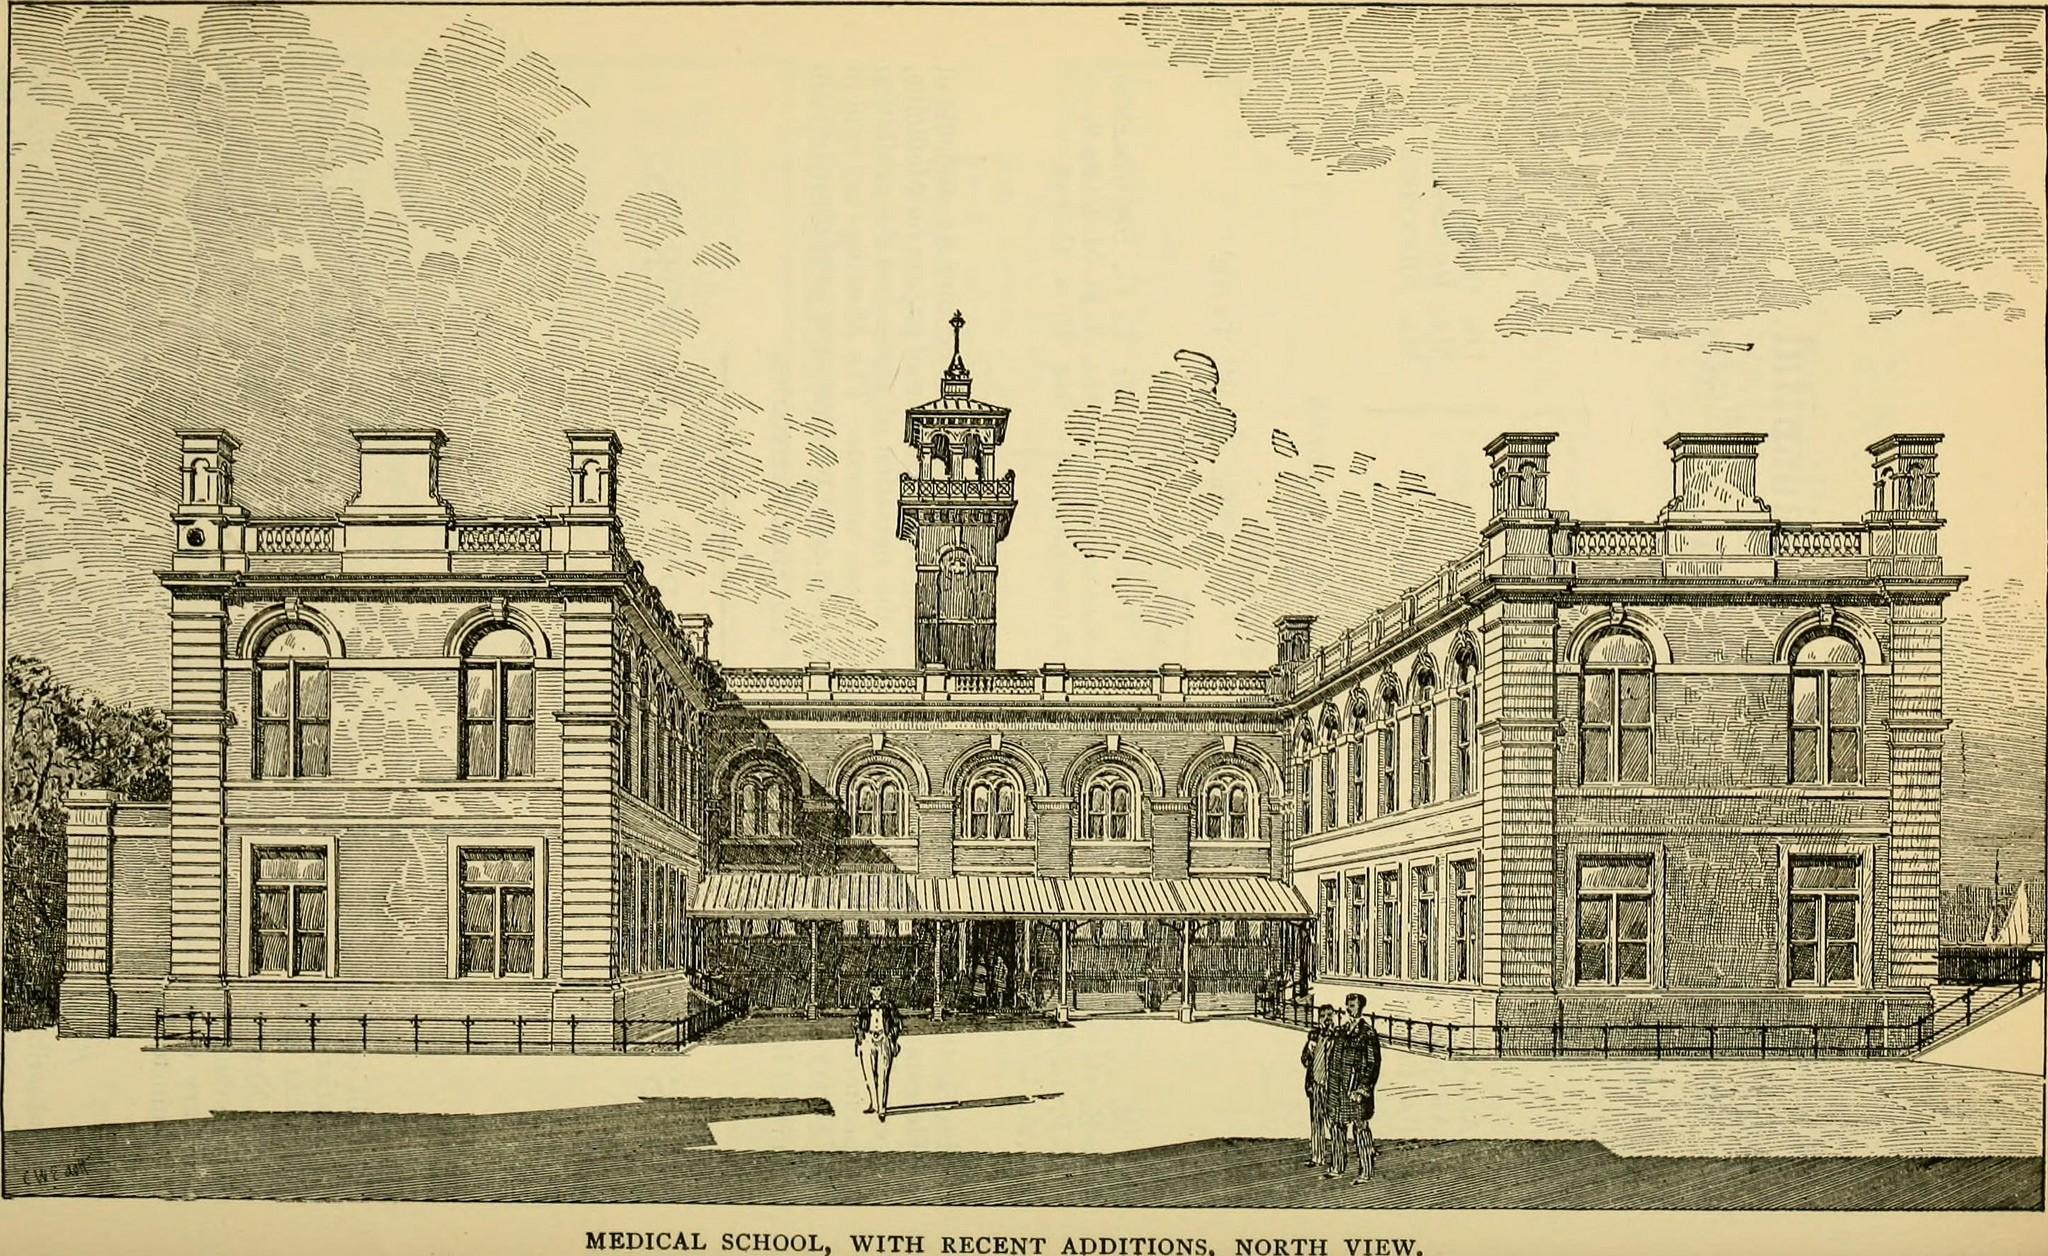 St Thomas's Hospital